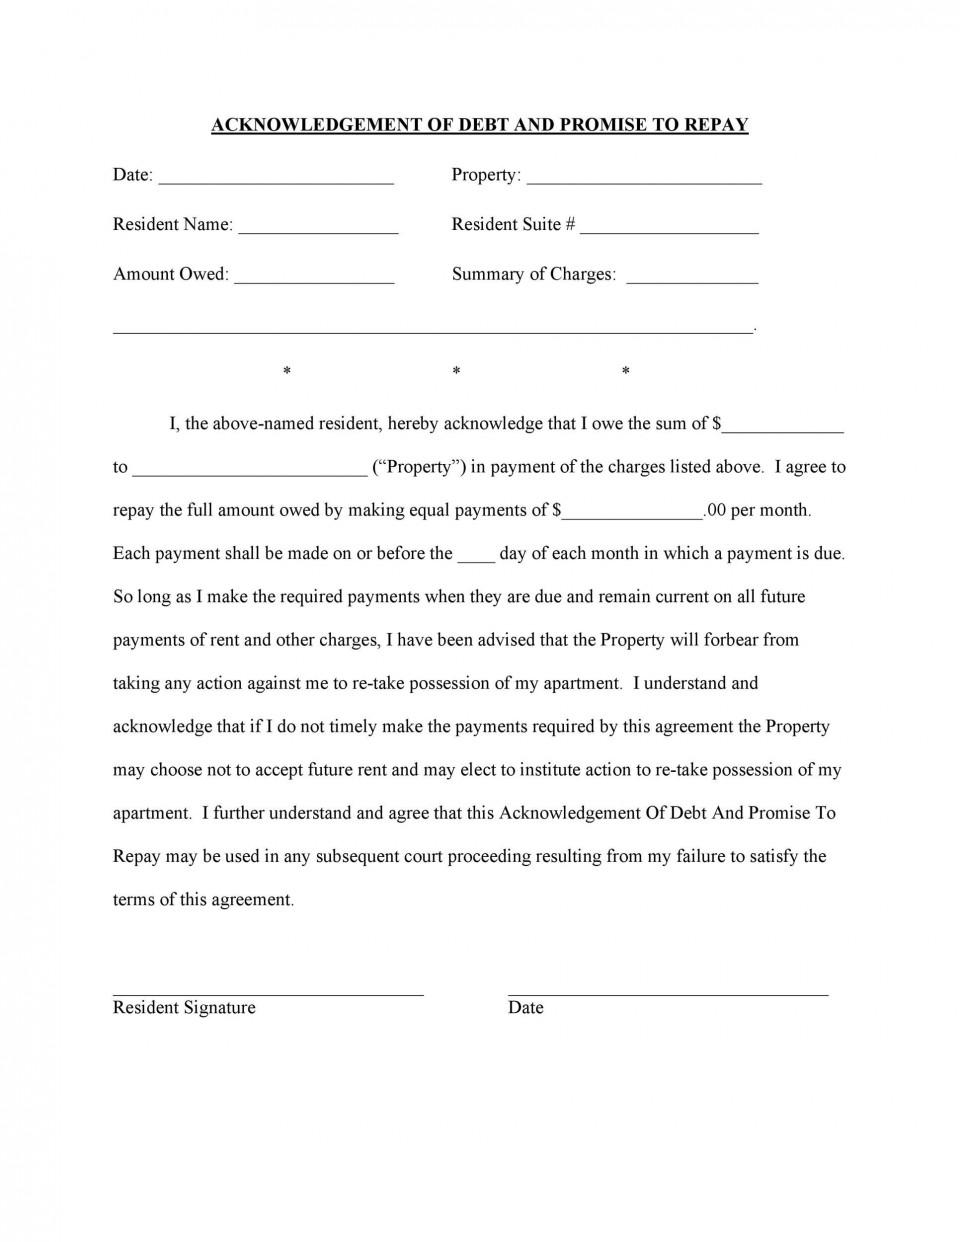 008 Unforgettable Free Family Loan Agreement Template Nz Idea 960